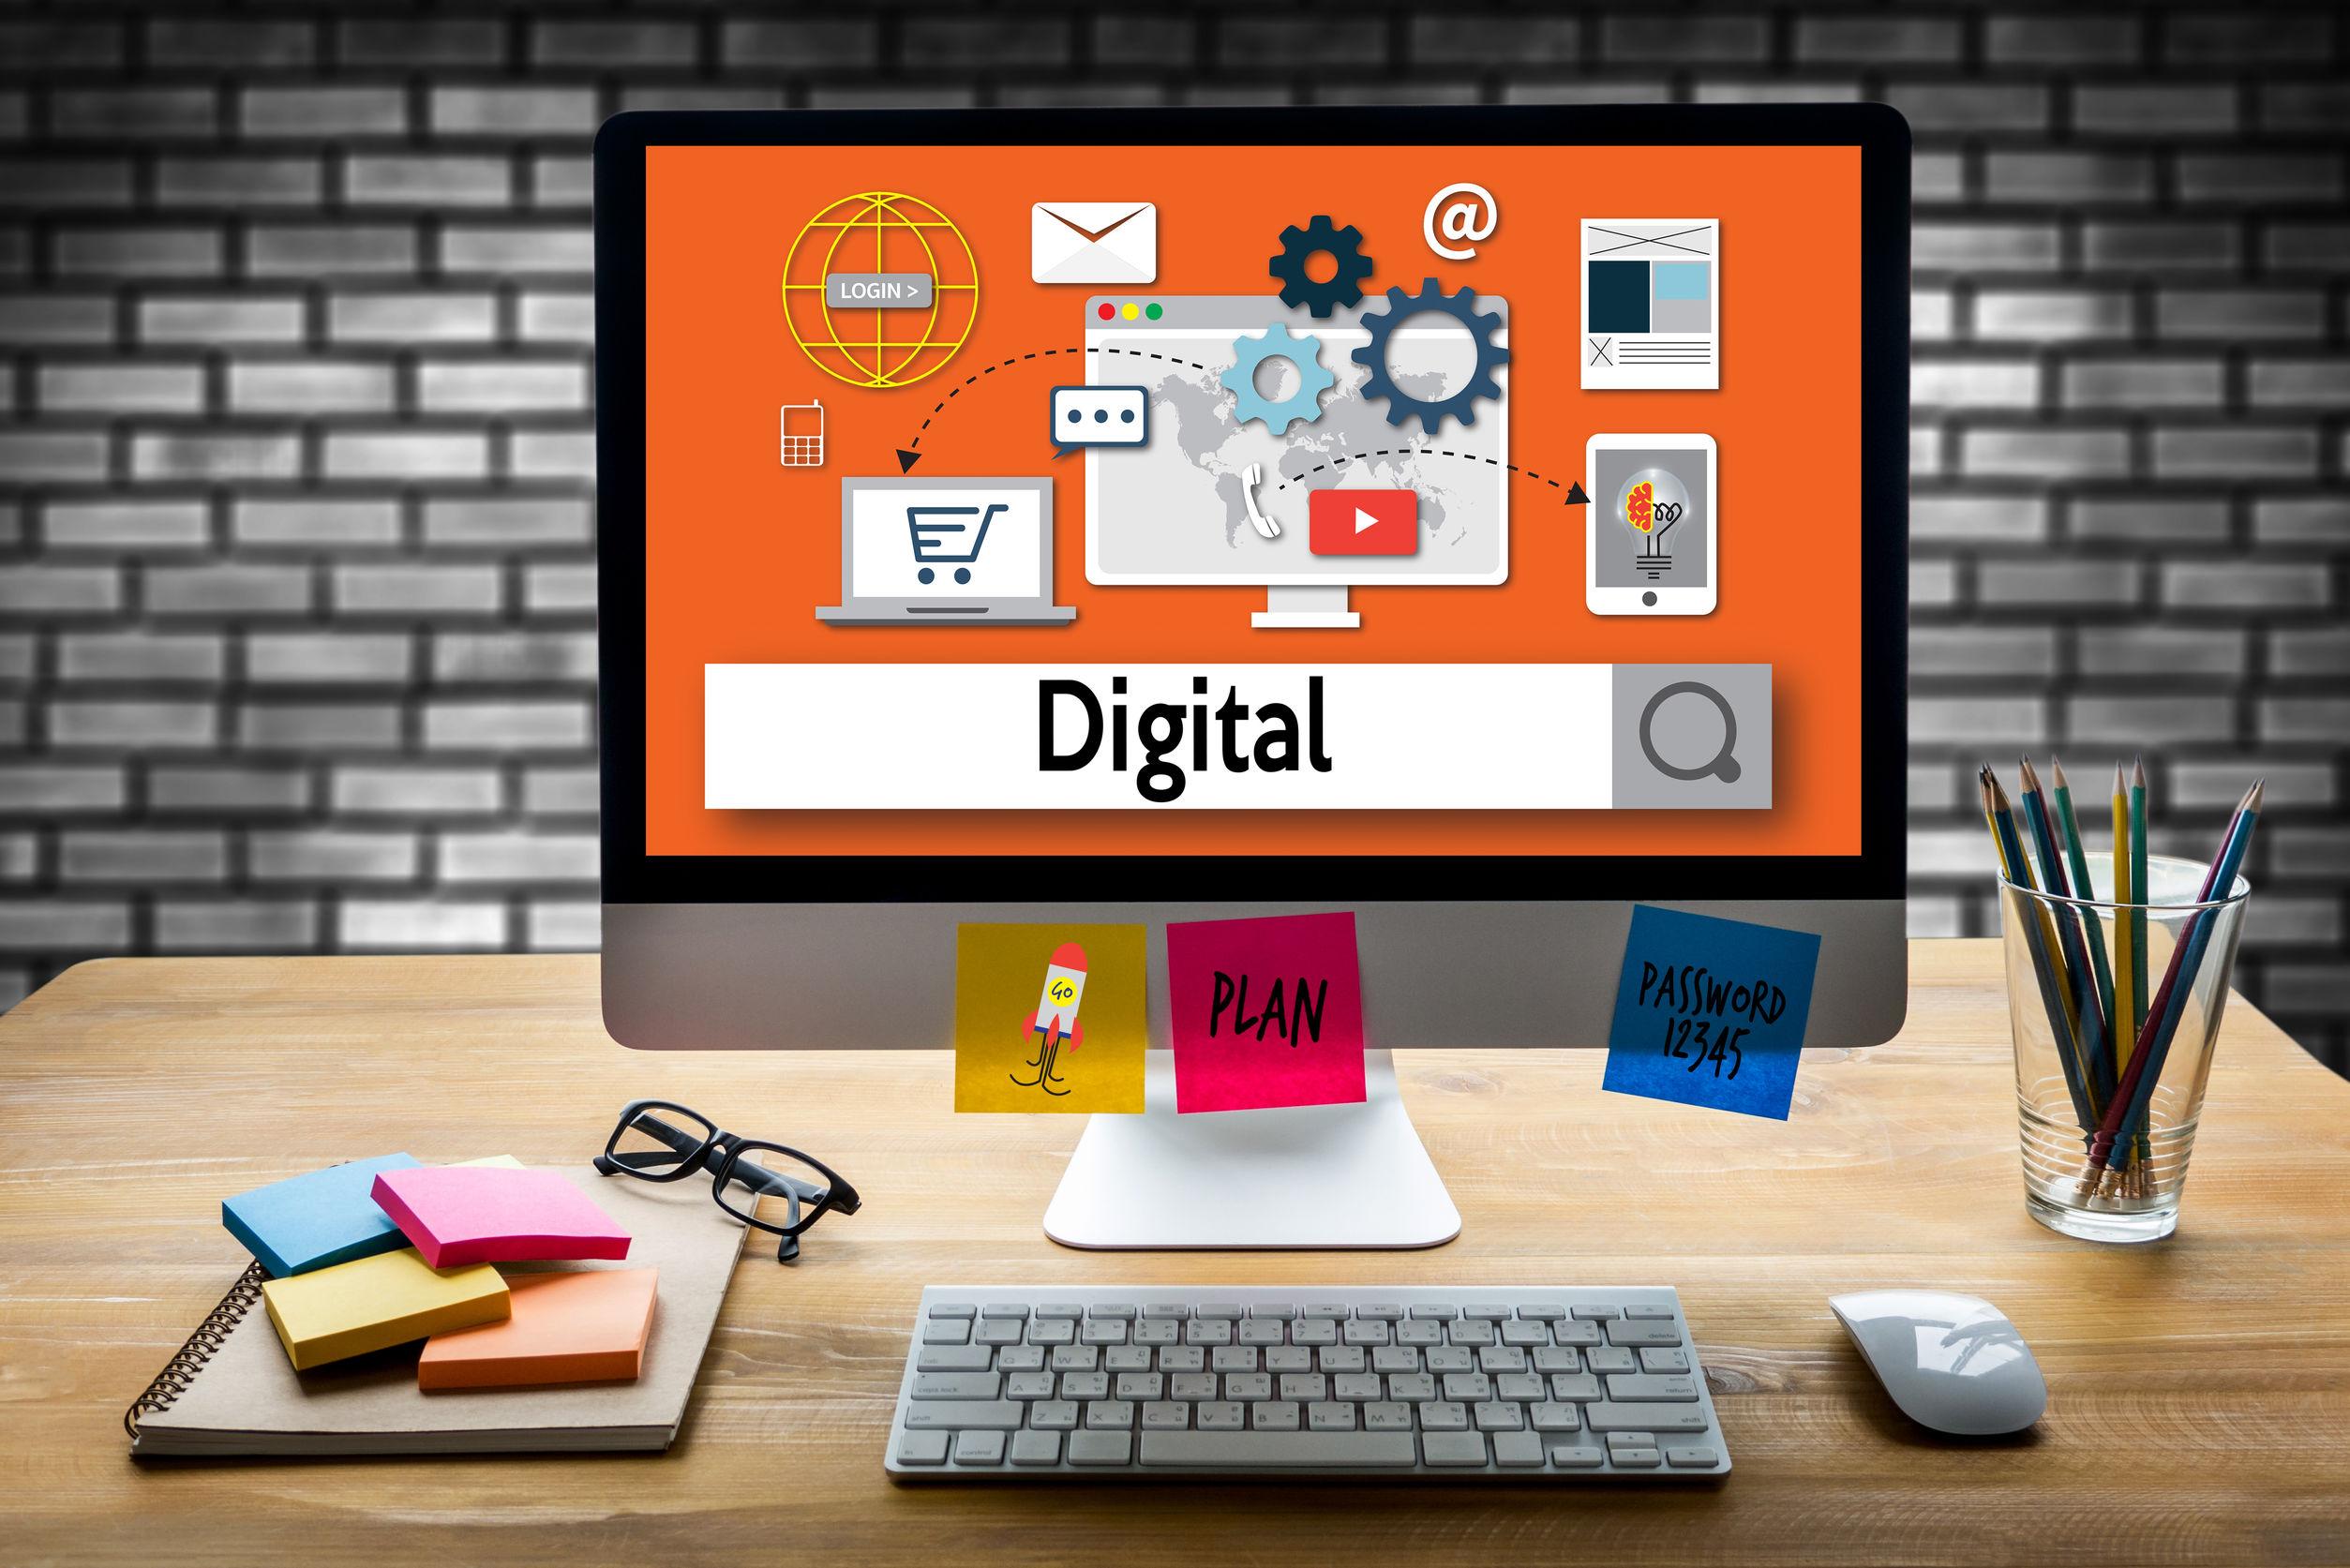 Ex2 Dec Blog 4 - Building an Effective Digital Transformation Plan and Budget for 2017.jpg